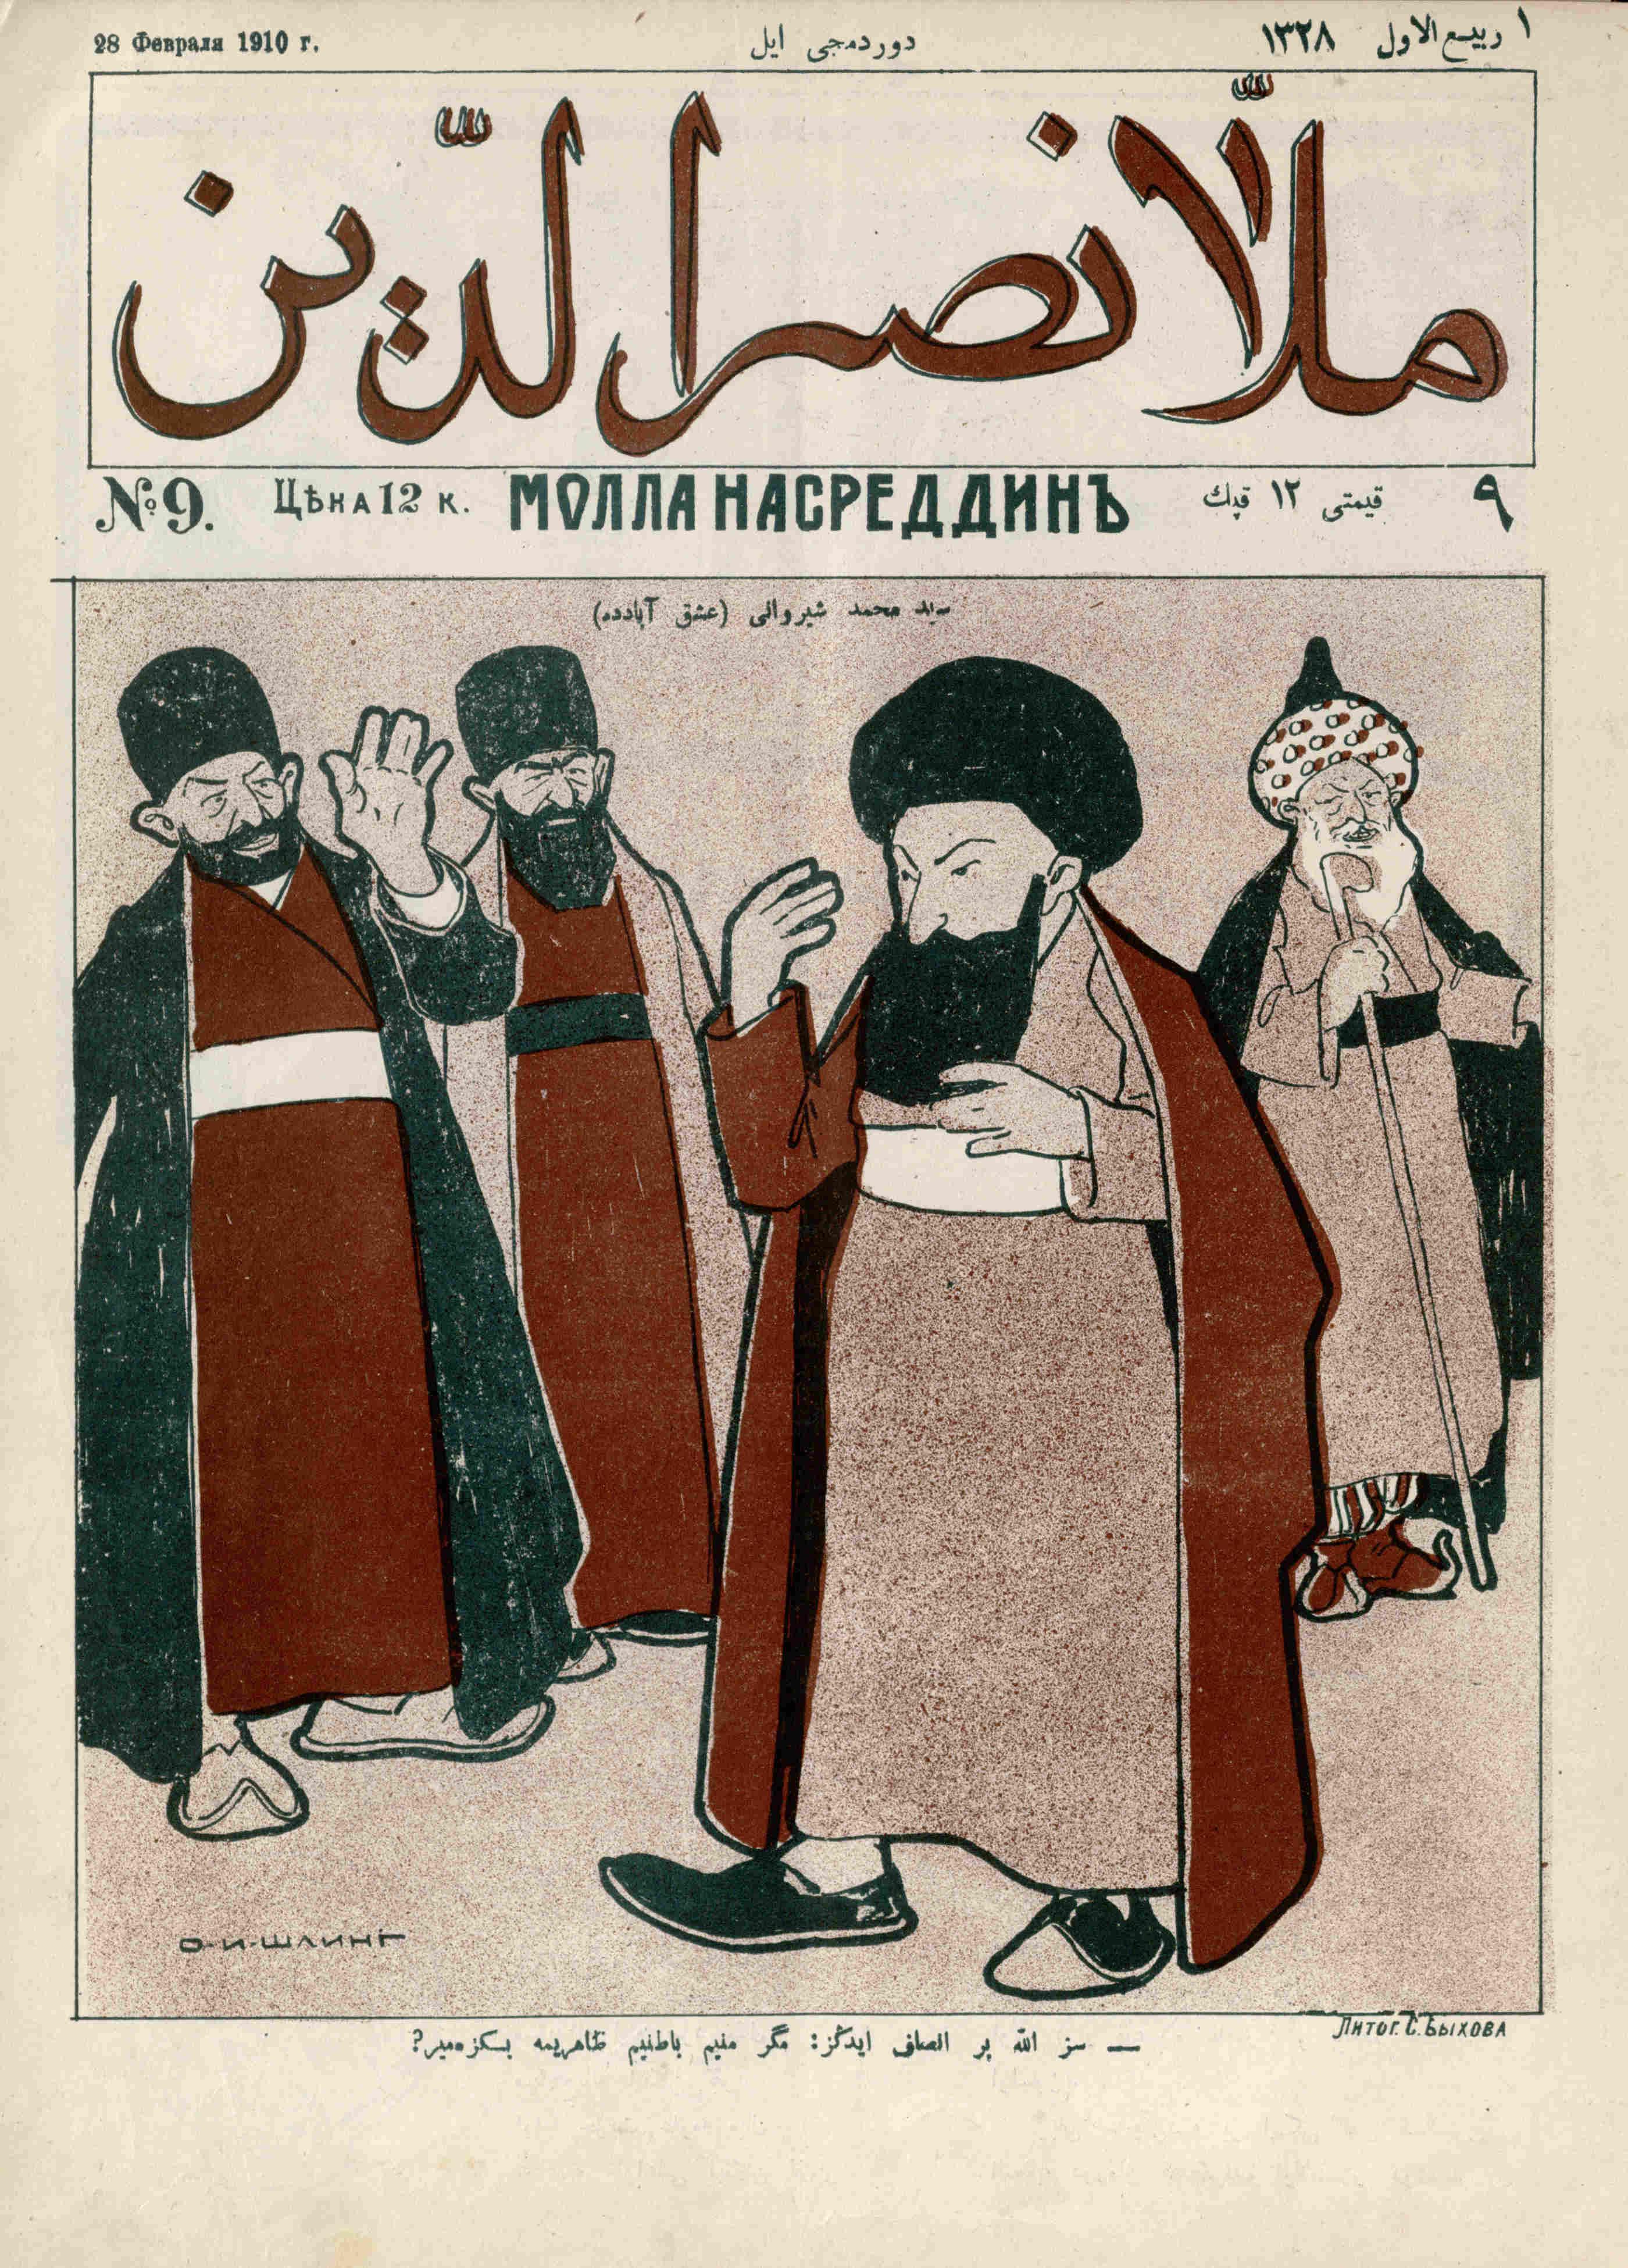 Molla Nasreddin, № 9 (1910)